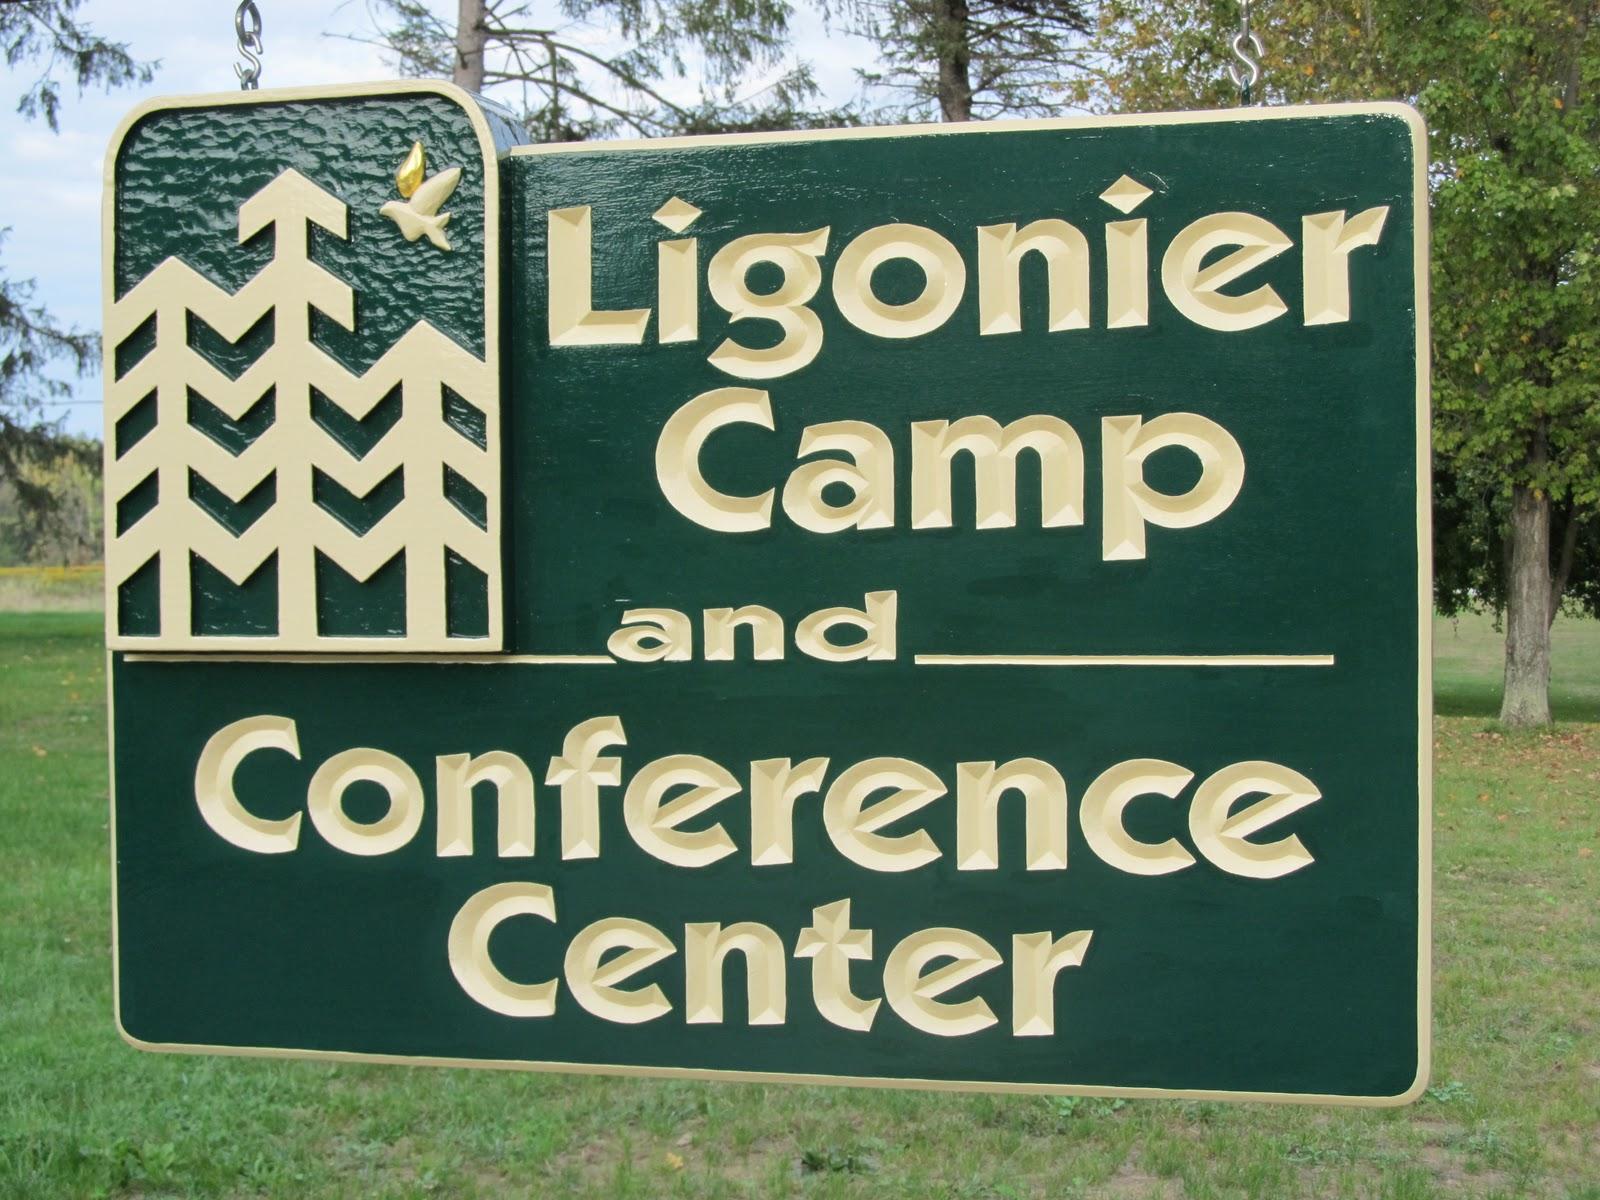 ligonier chatrooms Ligonier tavern, ligonier: see 322 unbiased reviews of ligonier tavern, rated 35 of 5 on tripadvisor and ranked #10 of 39 restaurants in ligonier.